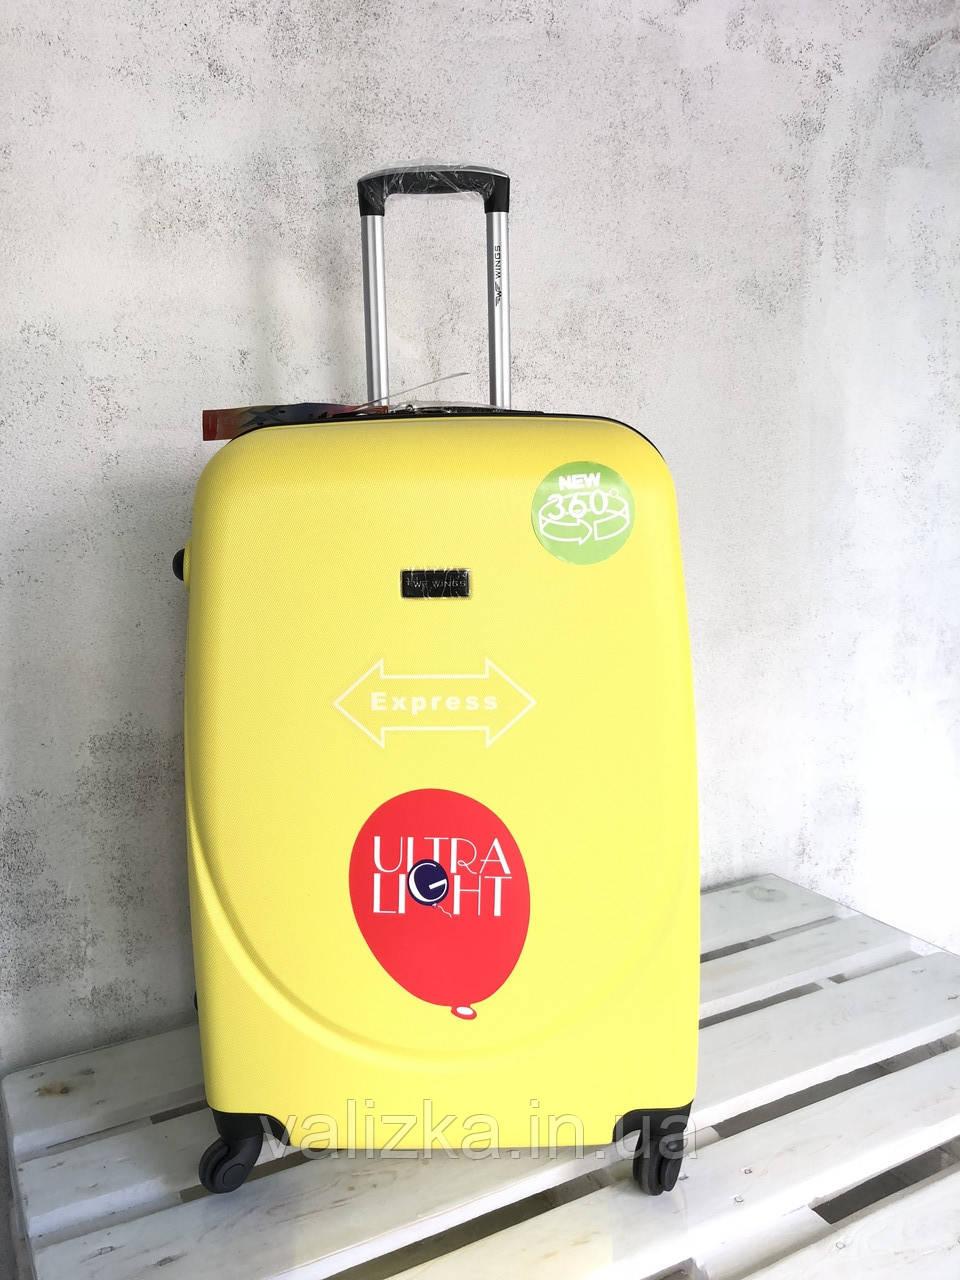 WINGS / Большой пластиковый чемодан на 4-х колесах желтый / Велика пластикова валіза на колесах жовта Польша